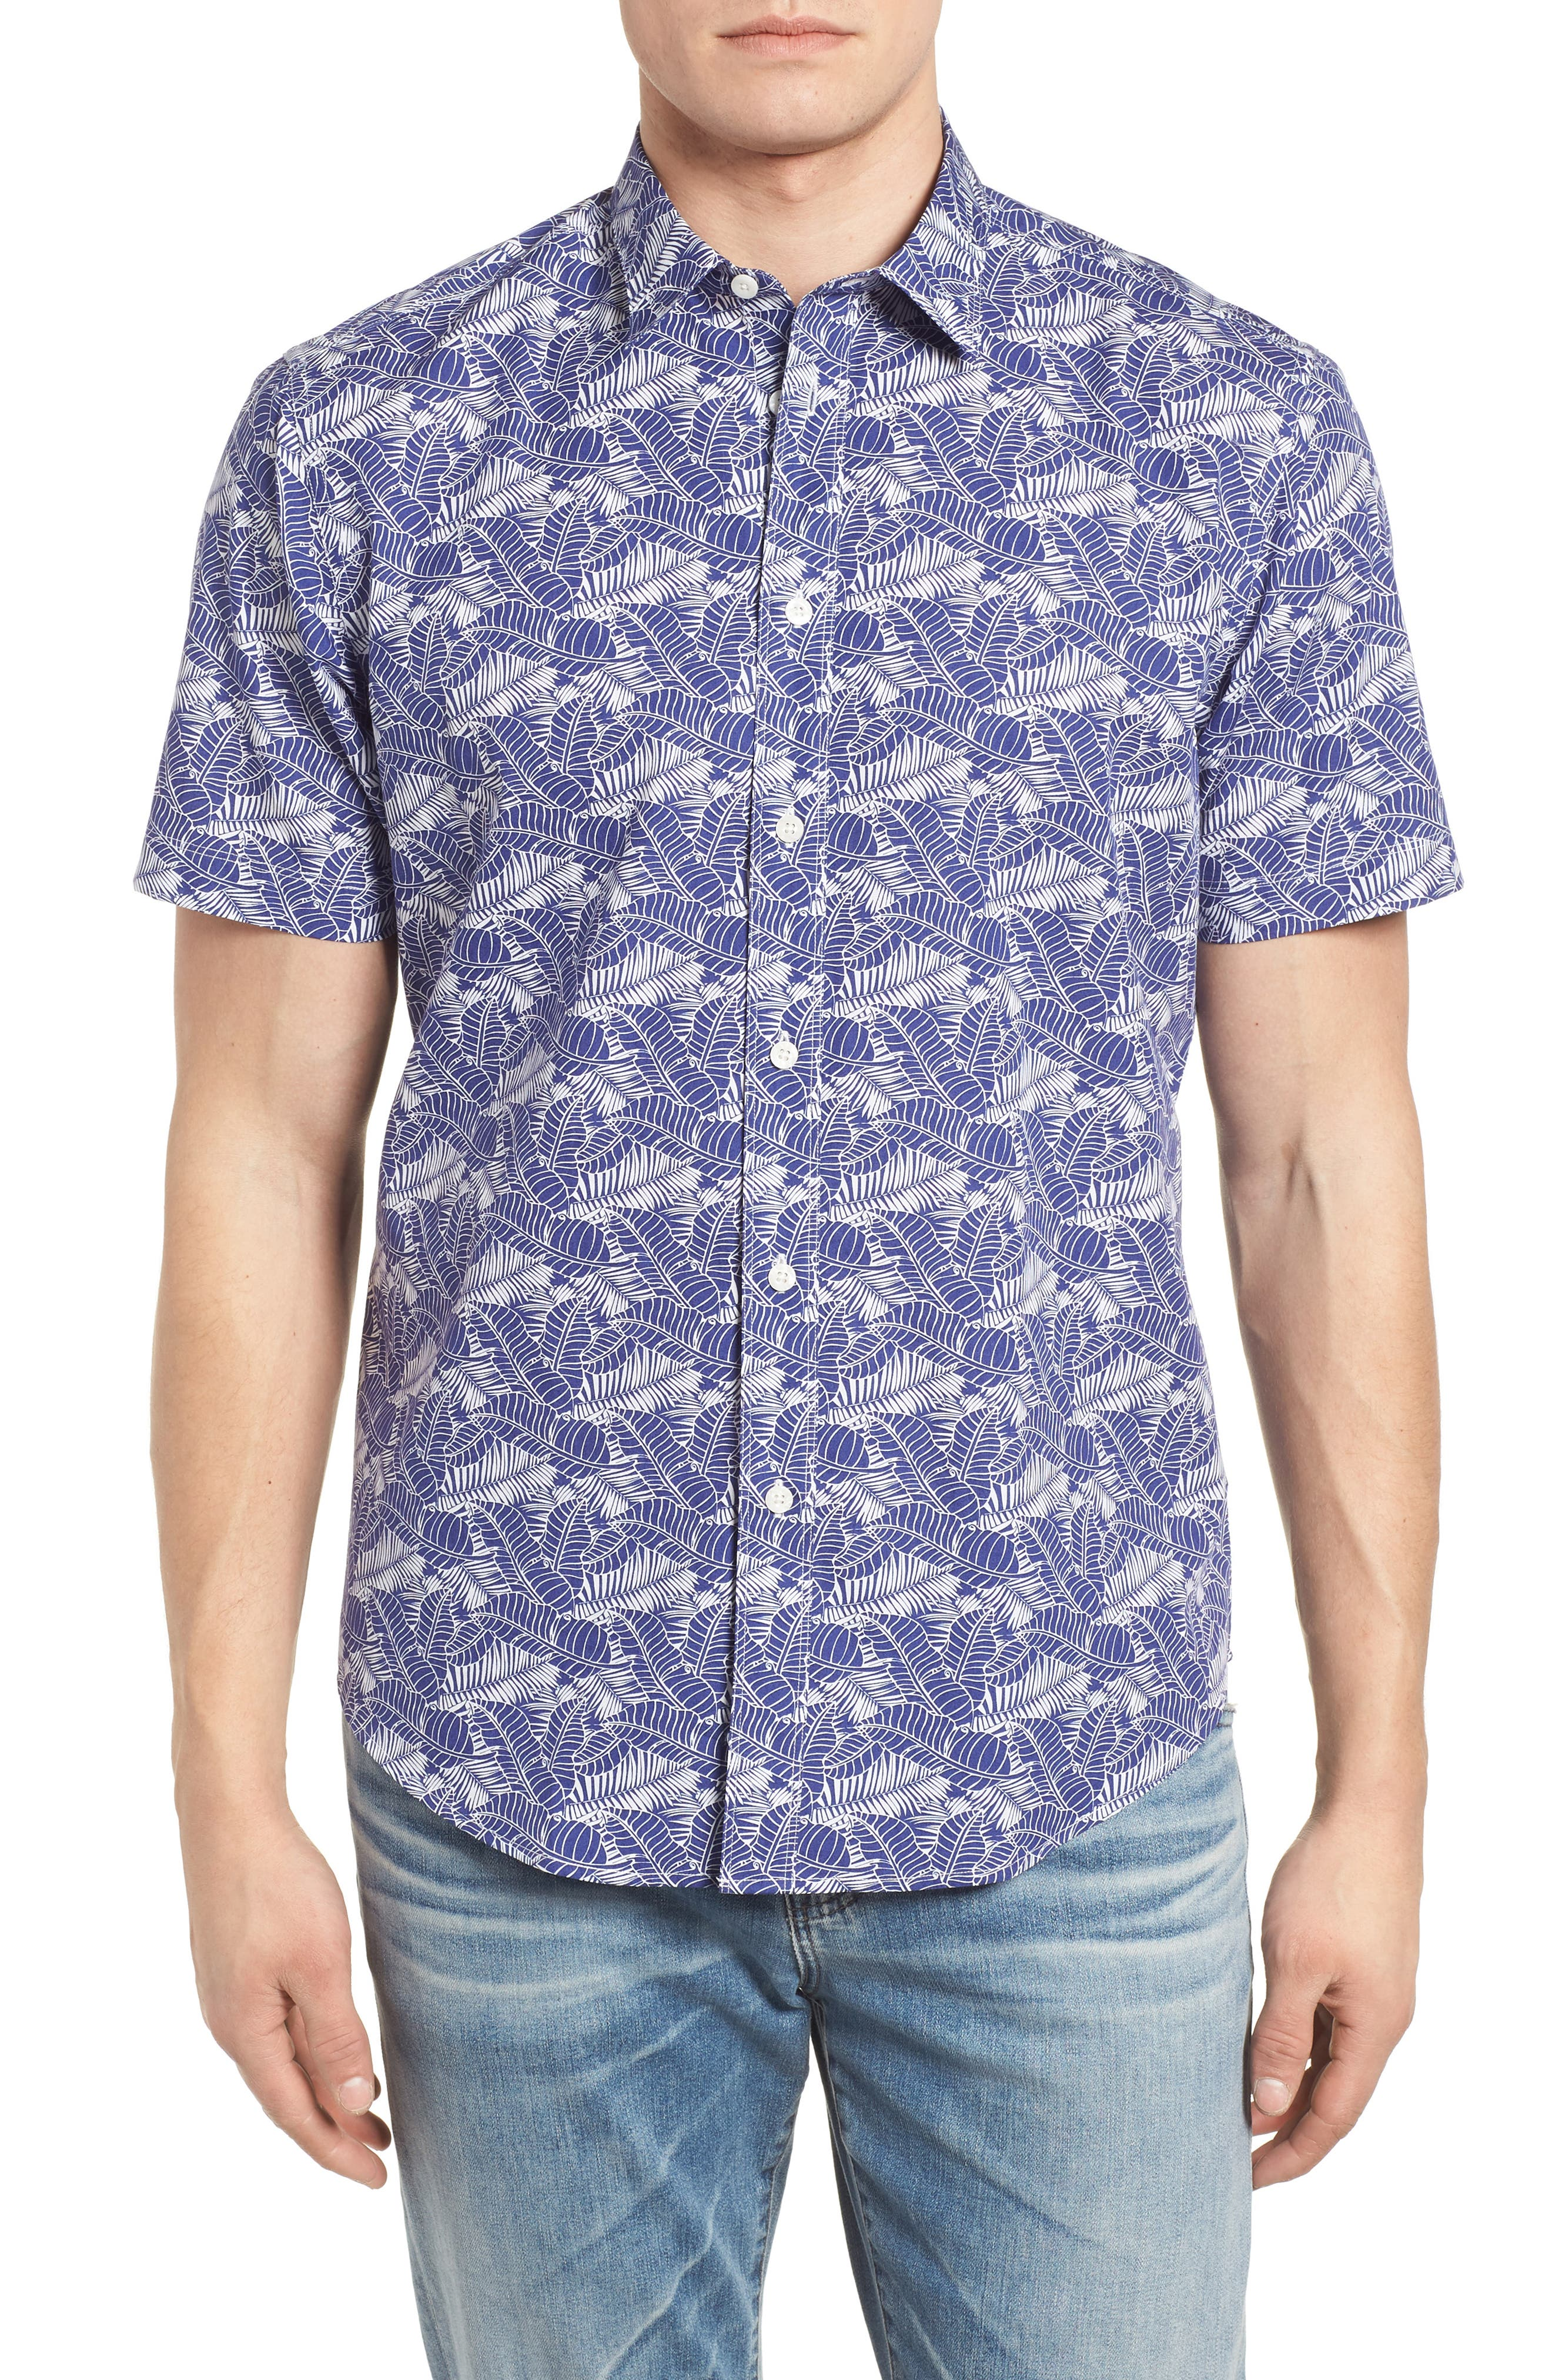 Coastaoro Lajoyas Regular Fit Palm Print Sport Shirt